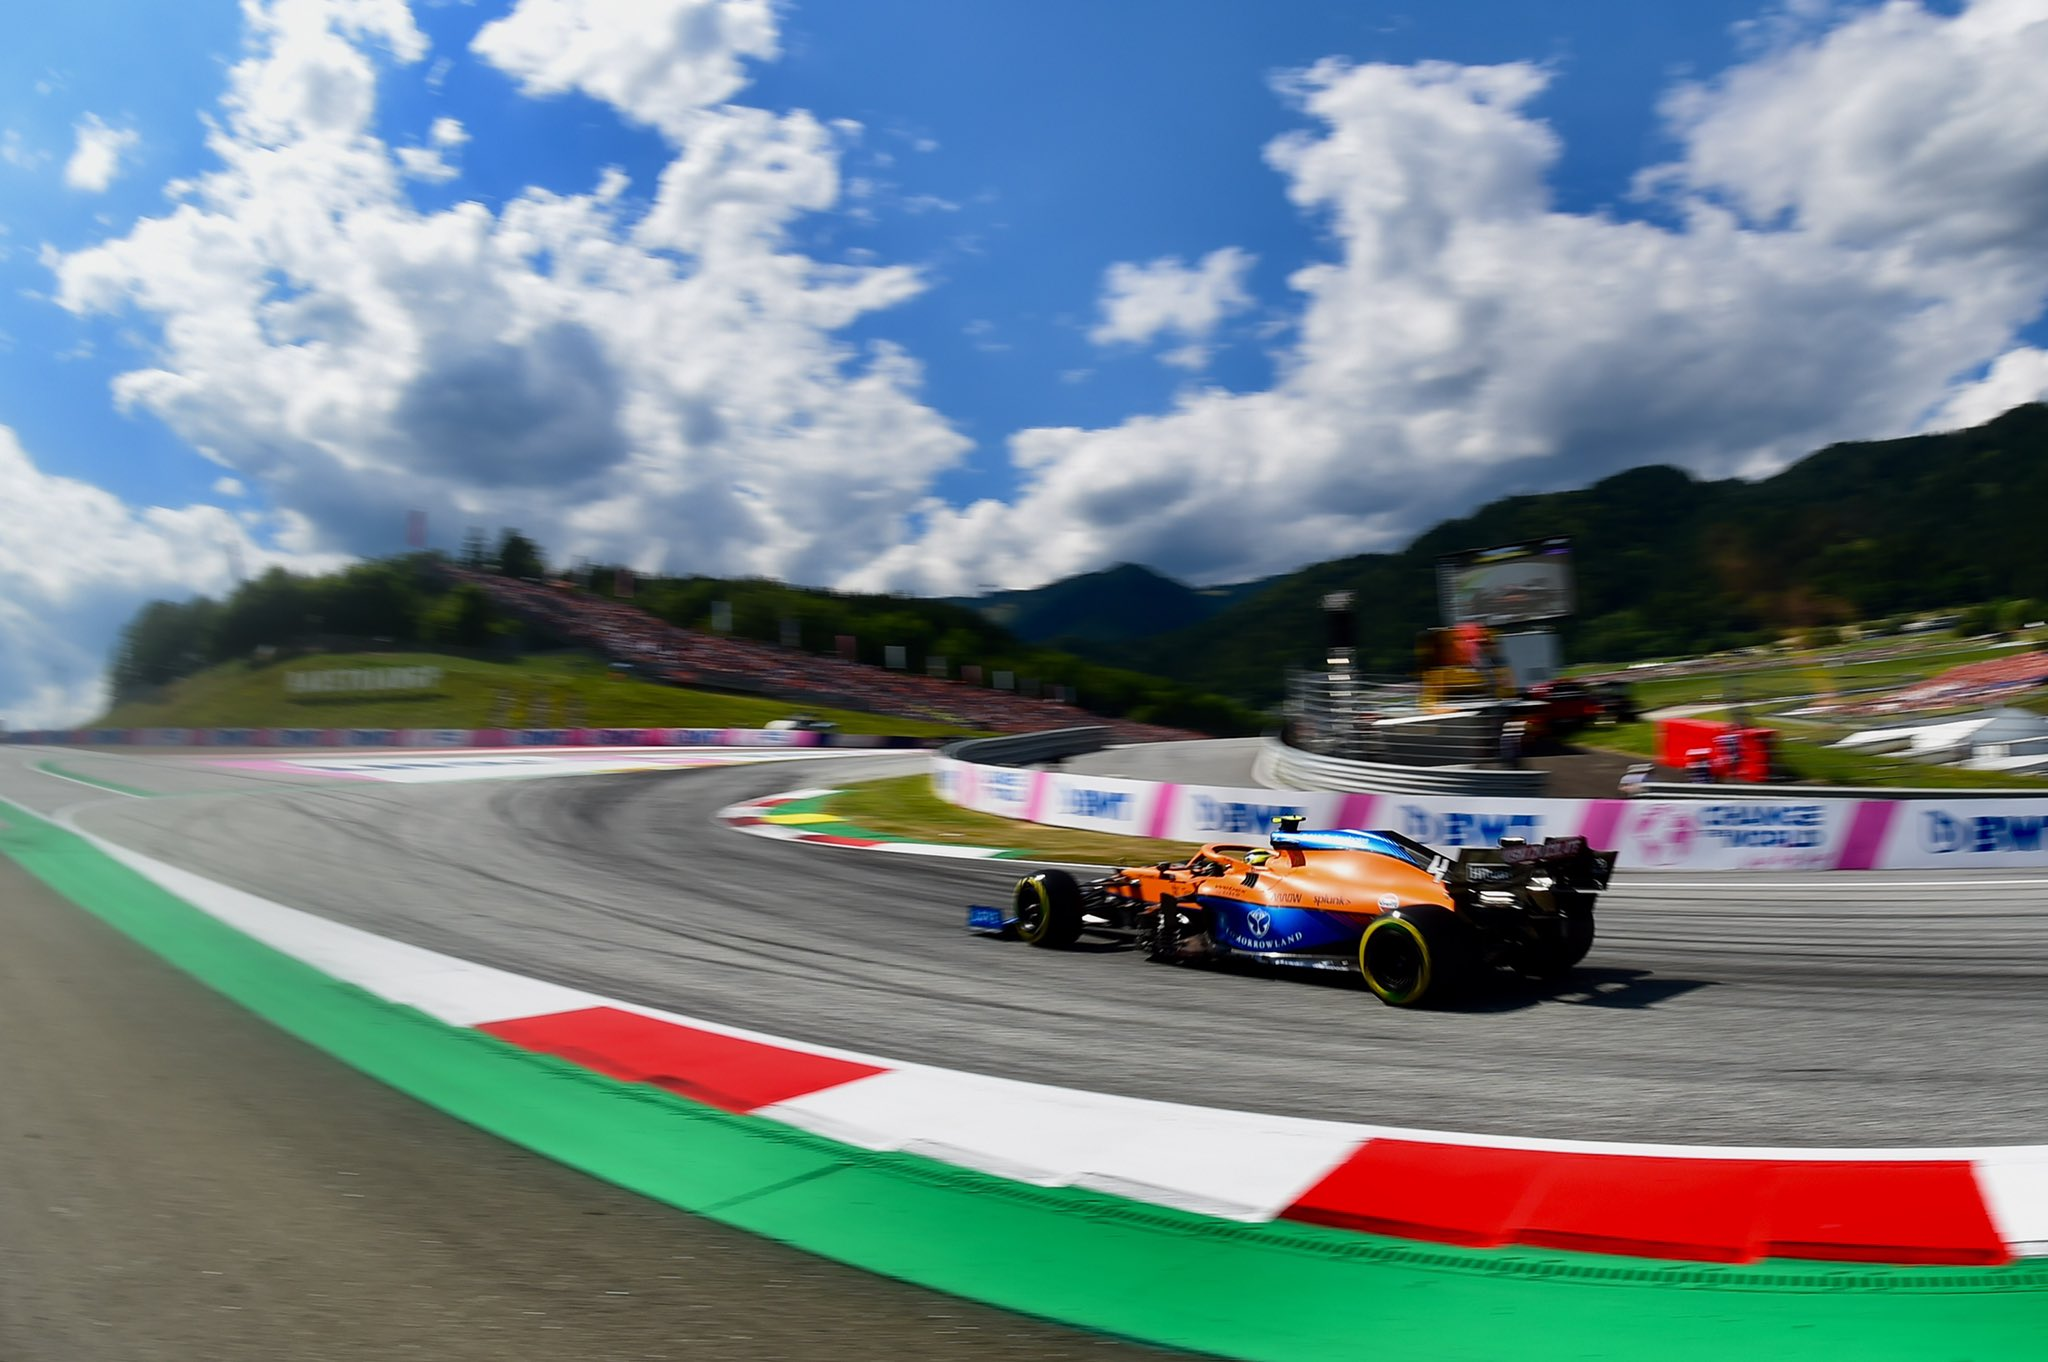 Domingo en Austria – McLaren: Norris brinda el tercer podio de la temporada